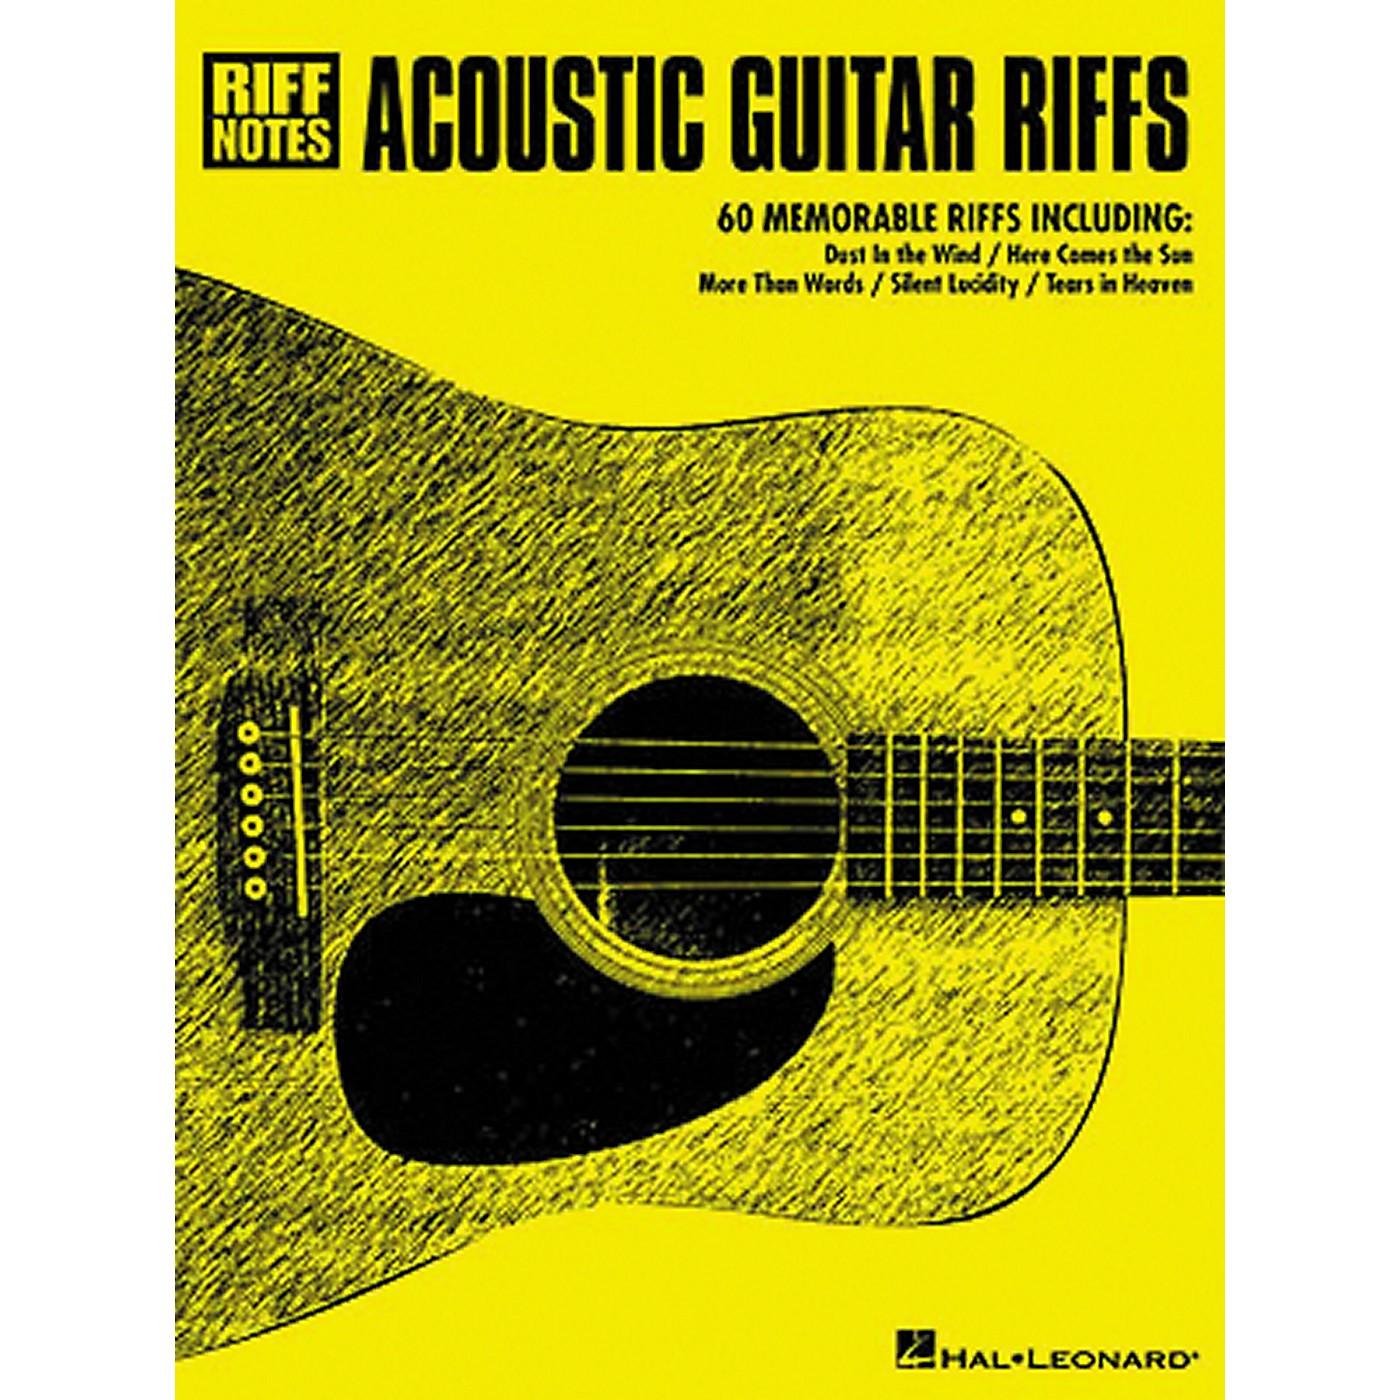 Hal Leonard Acoustic Guitar Riffs Tab Songbook thumbnail